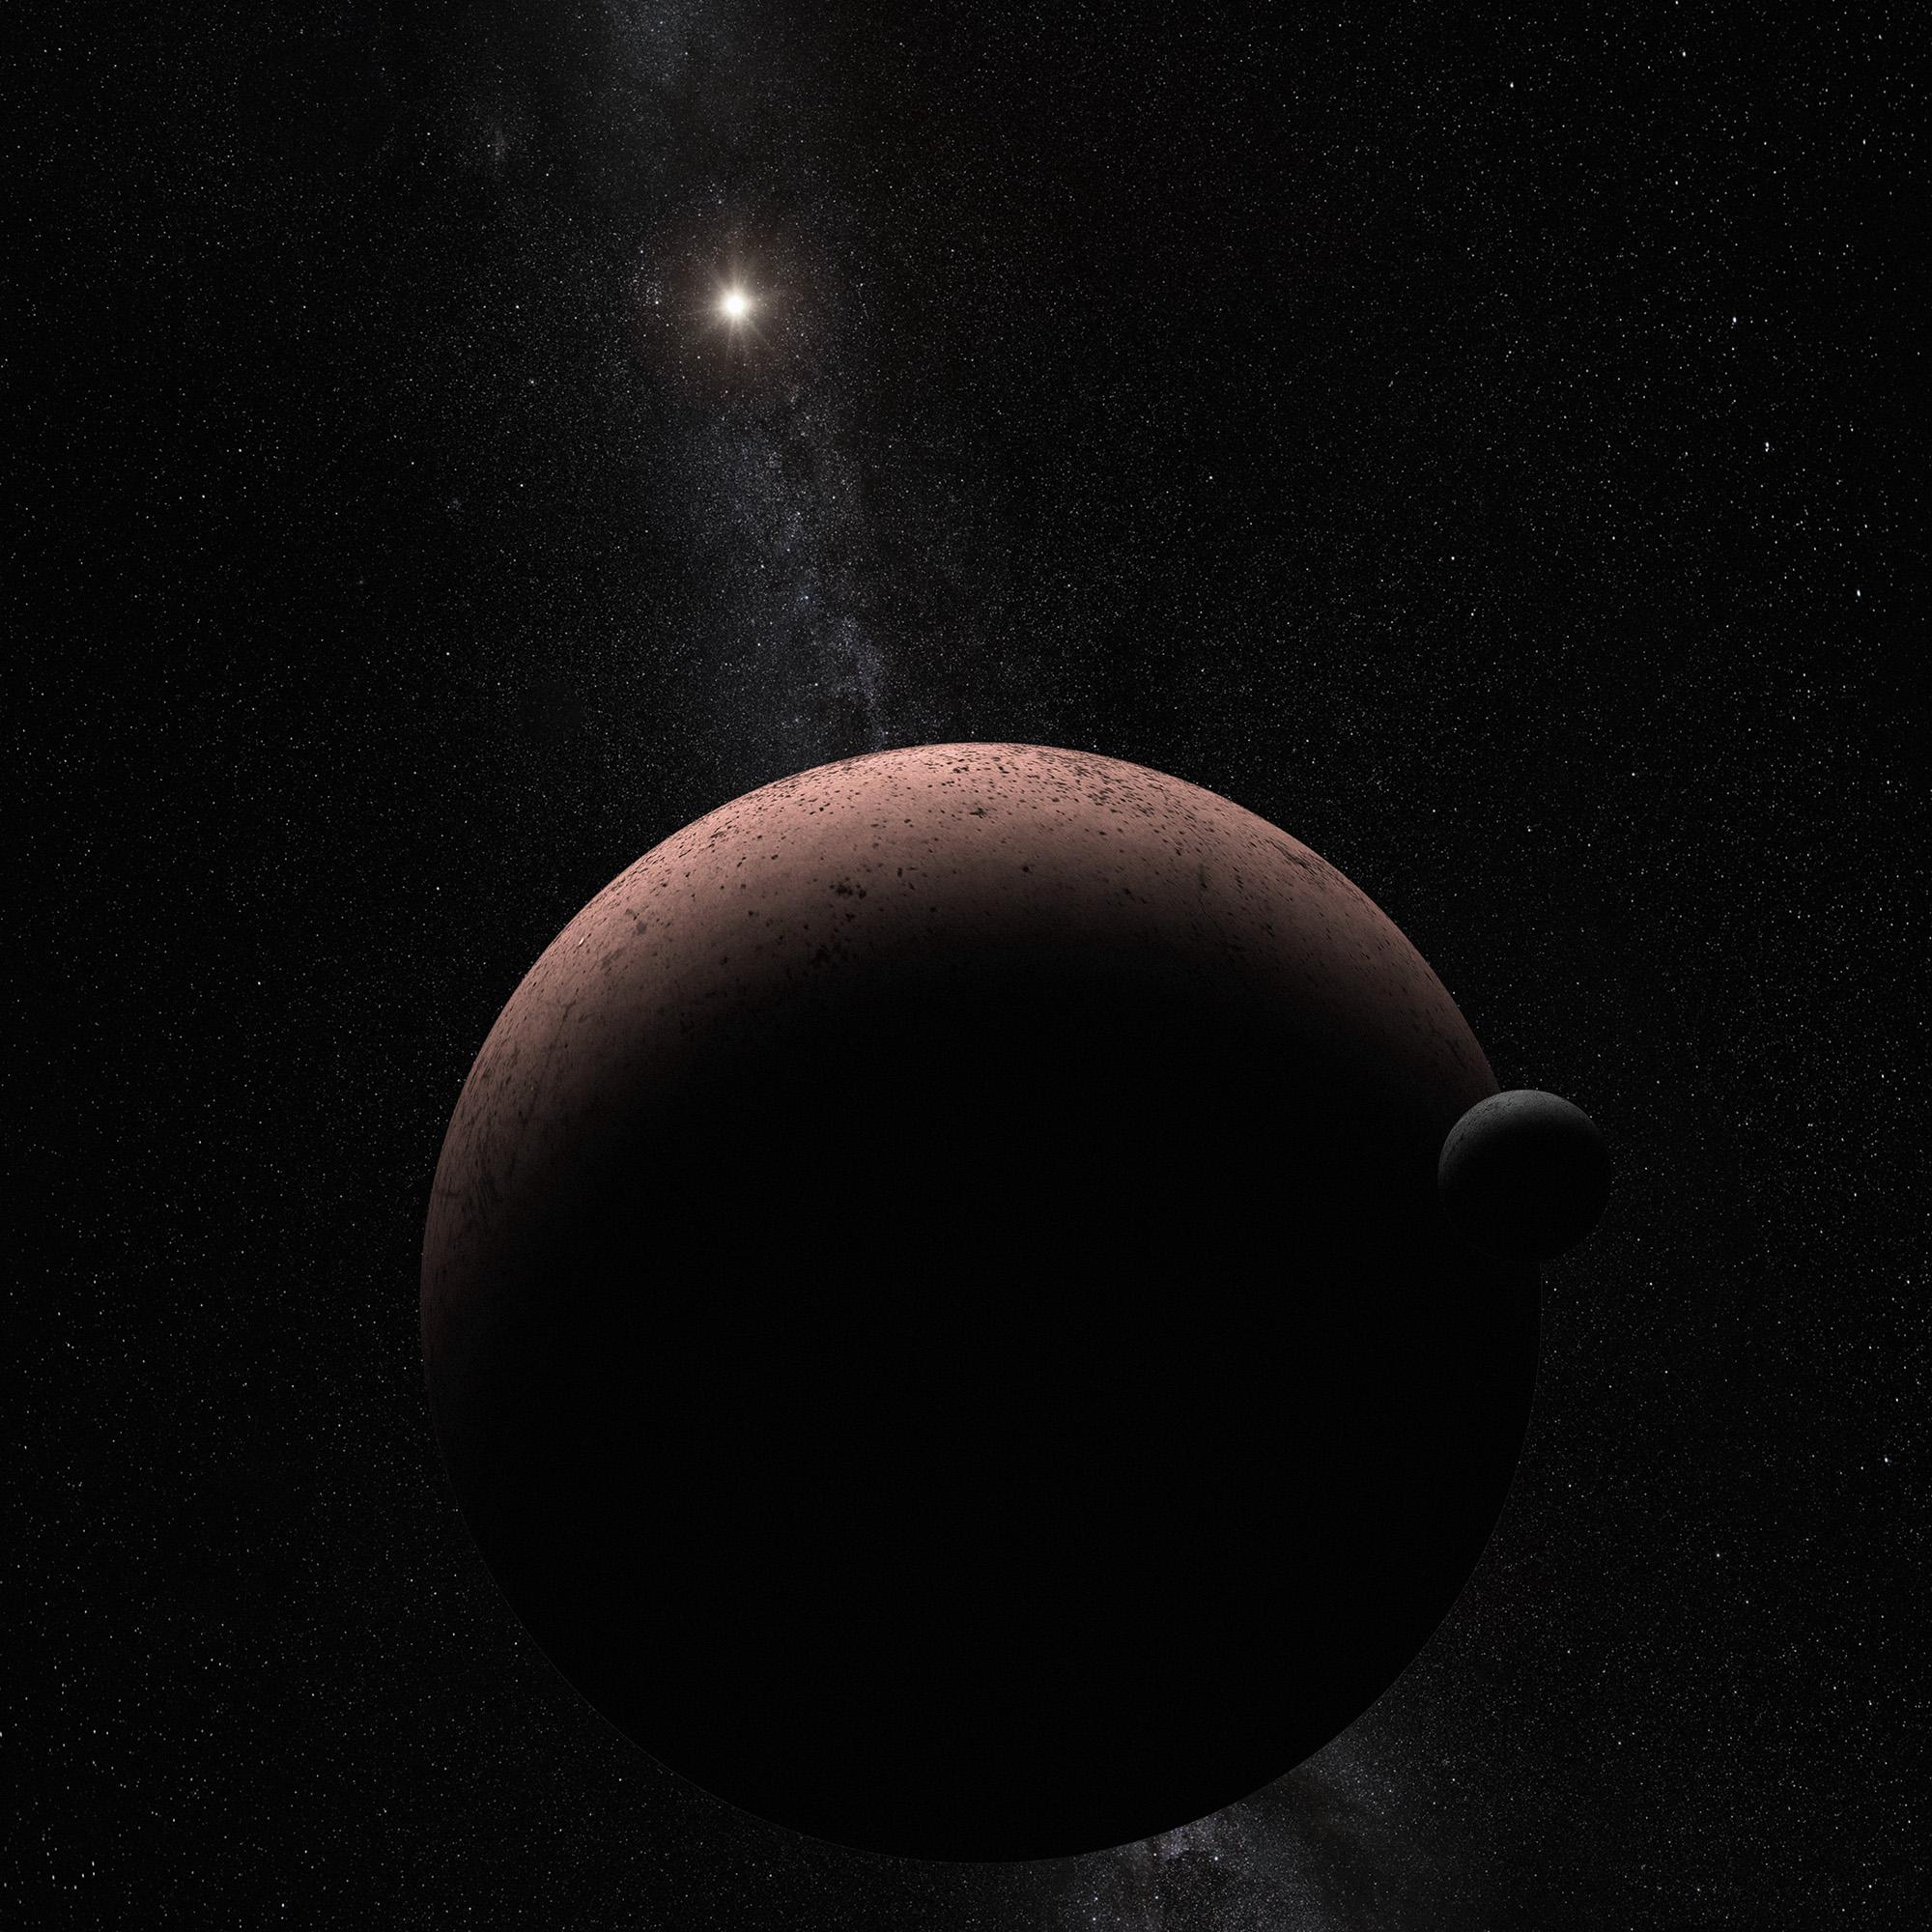 Dwarf Planet Makemake and Moon (Artist's Illustration)